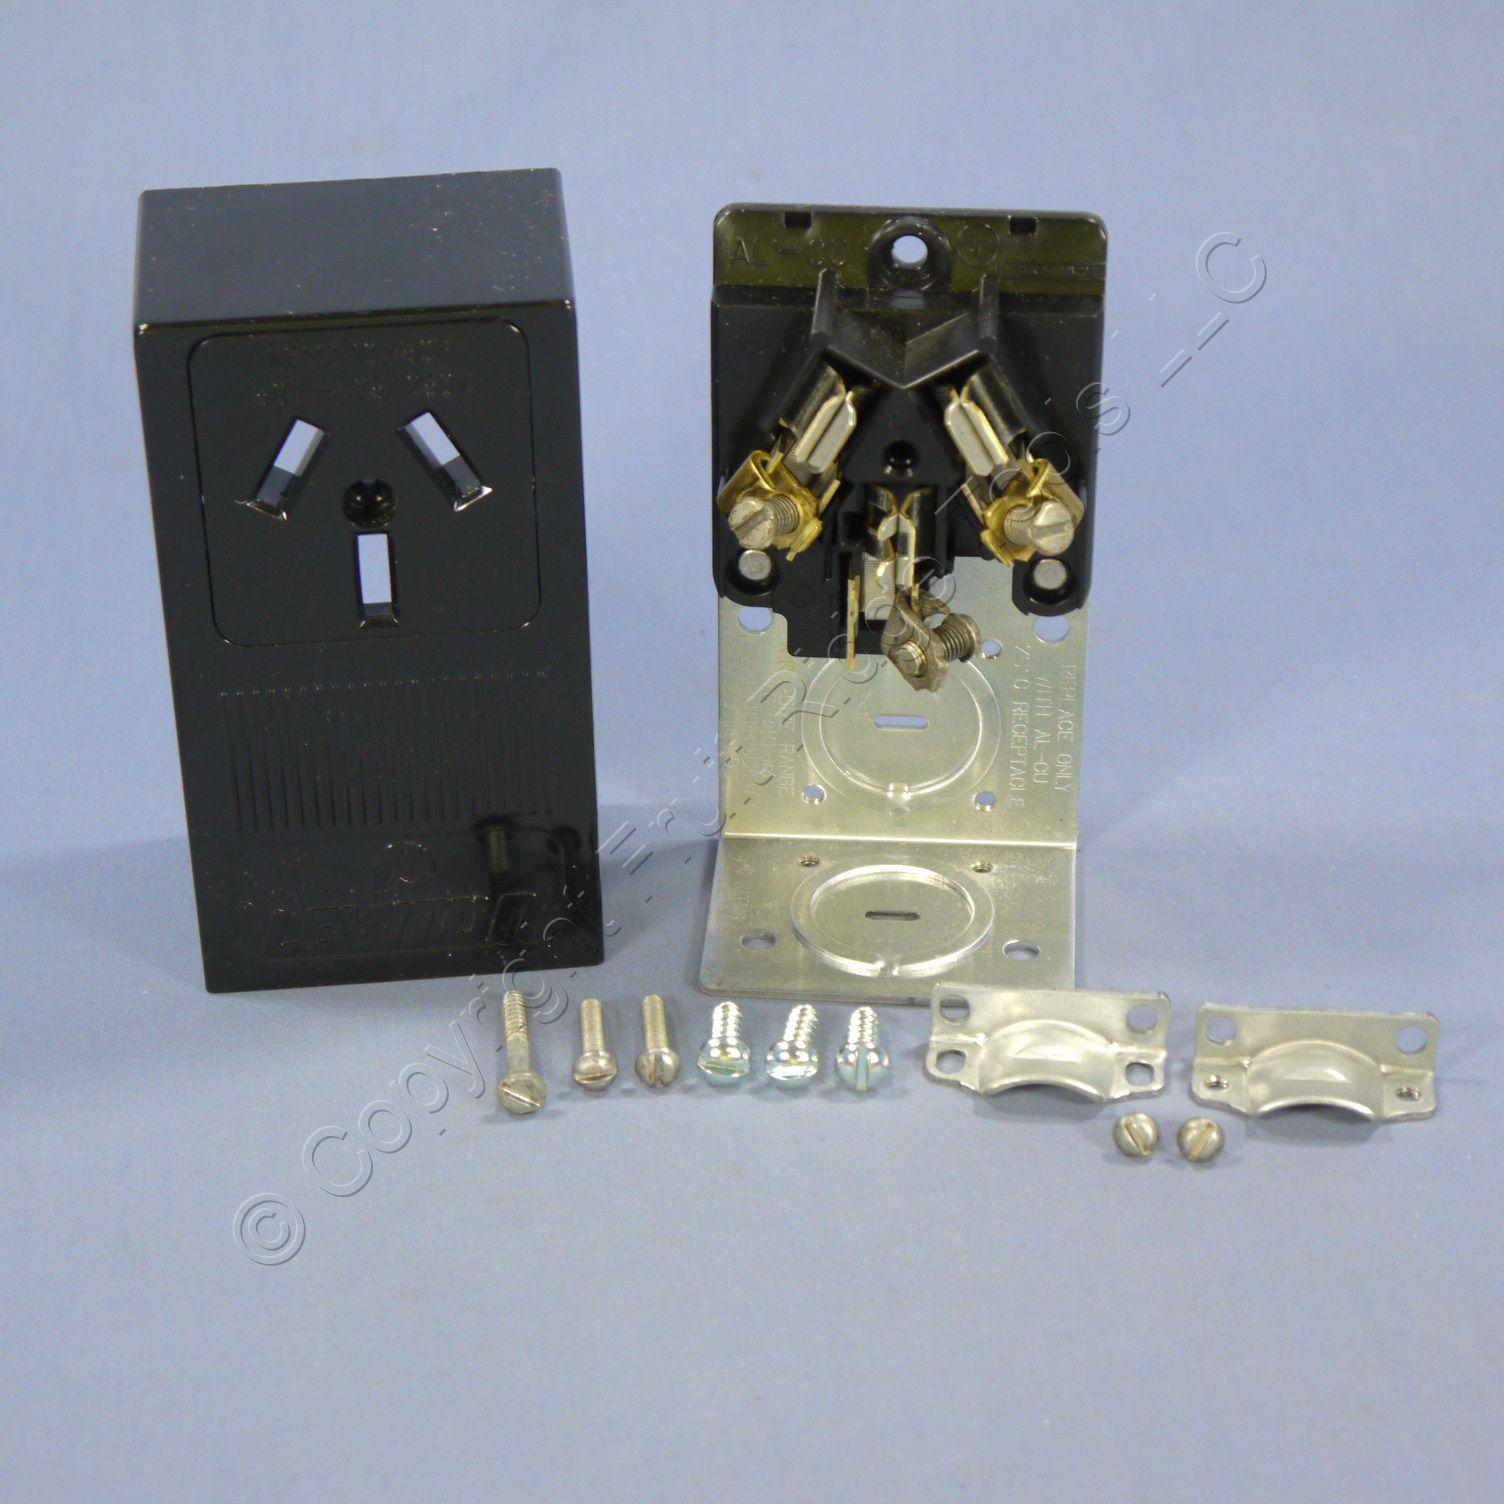 hight resolution of shop leviton range dryer 10 50 surface mount receptacle outlet nema 10